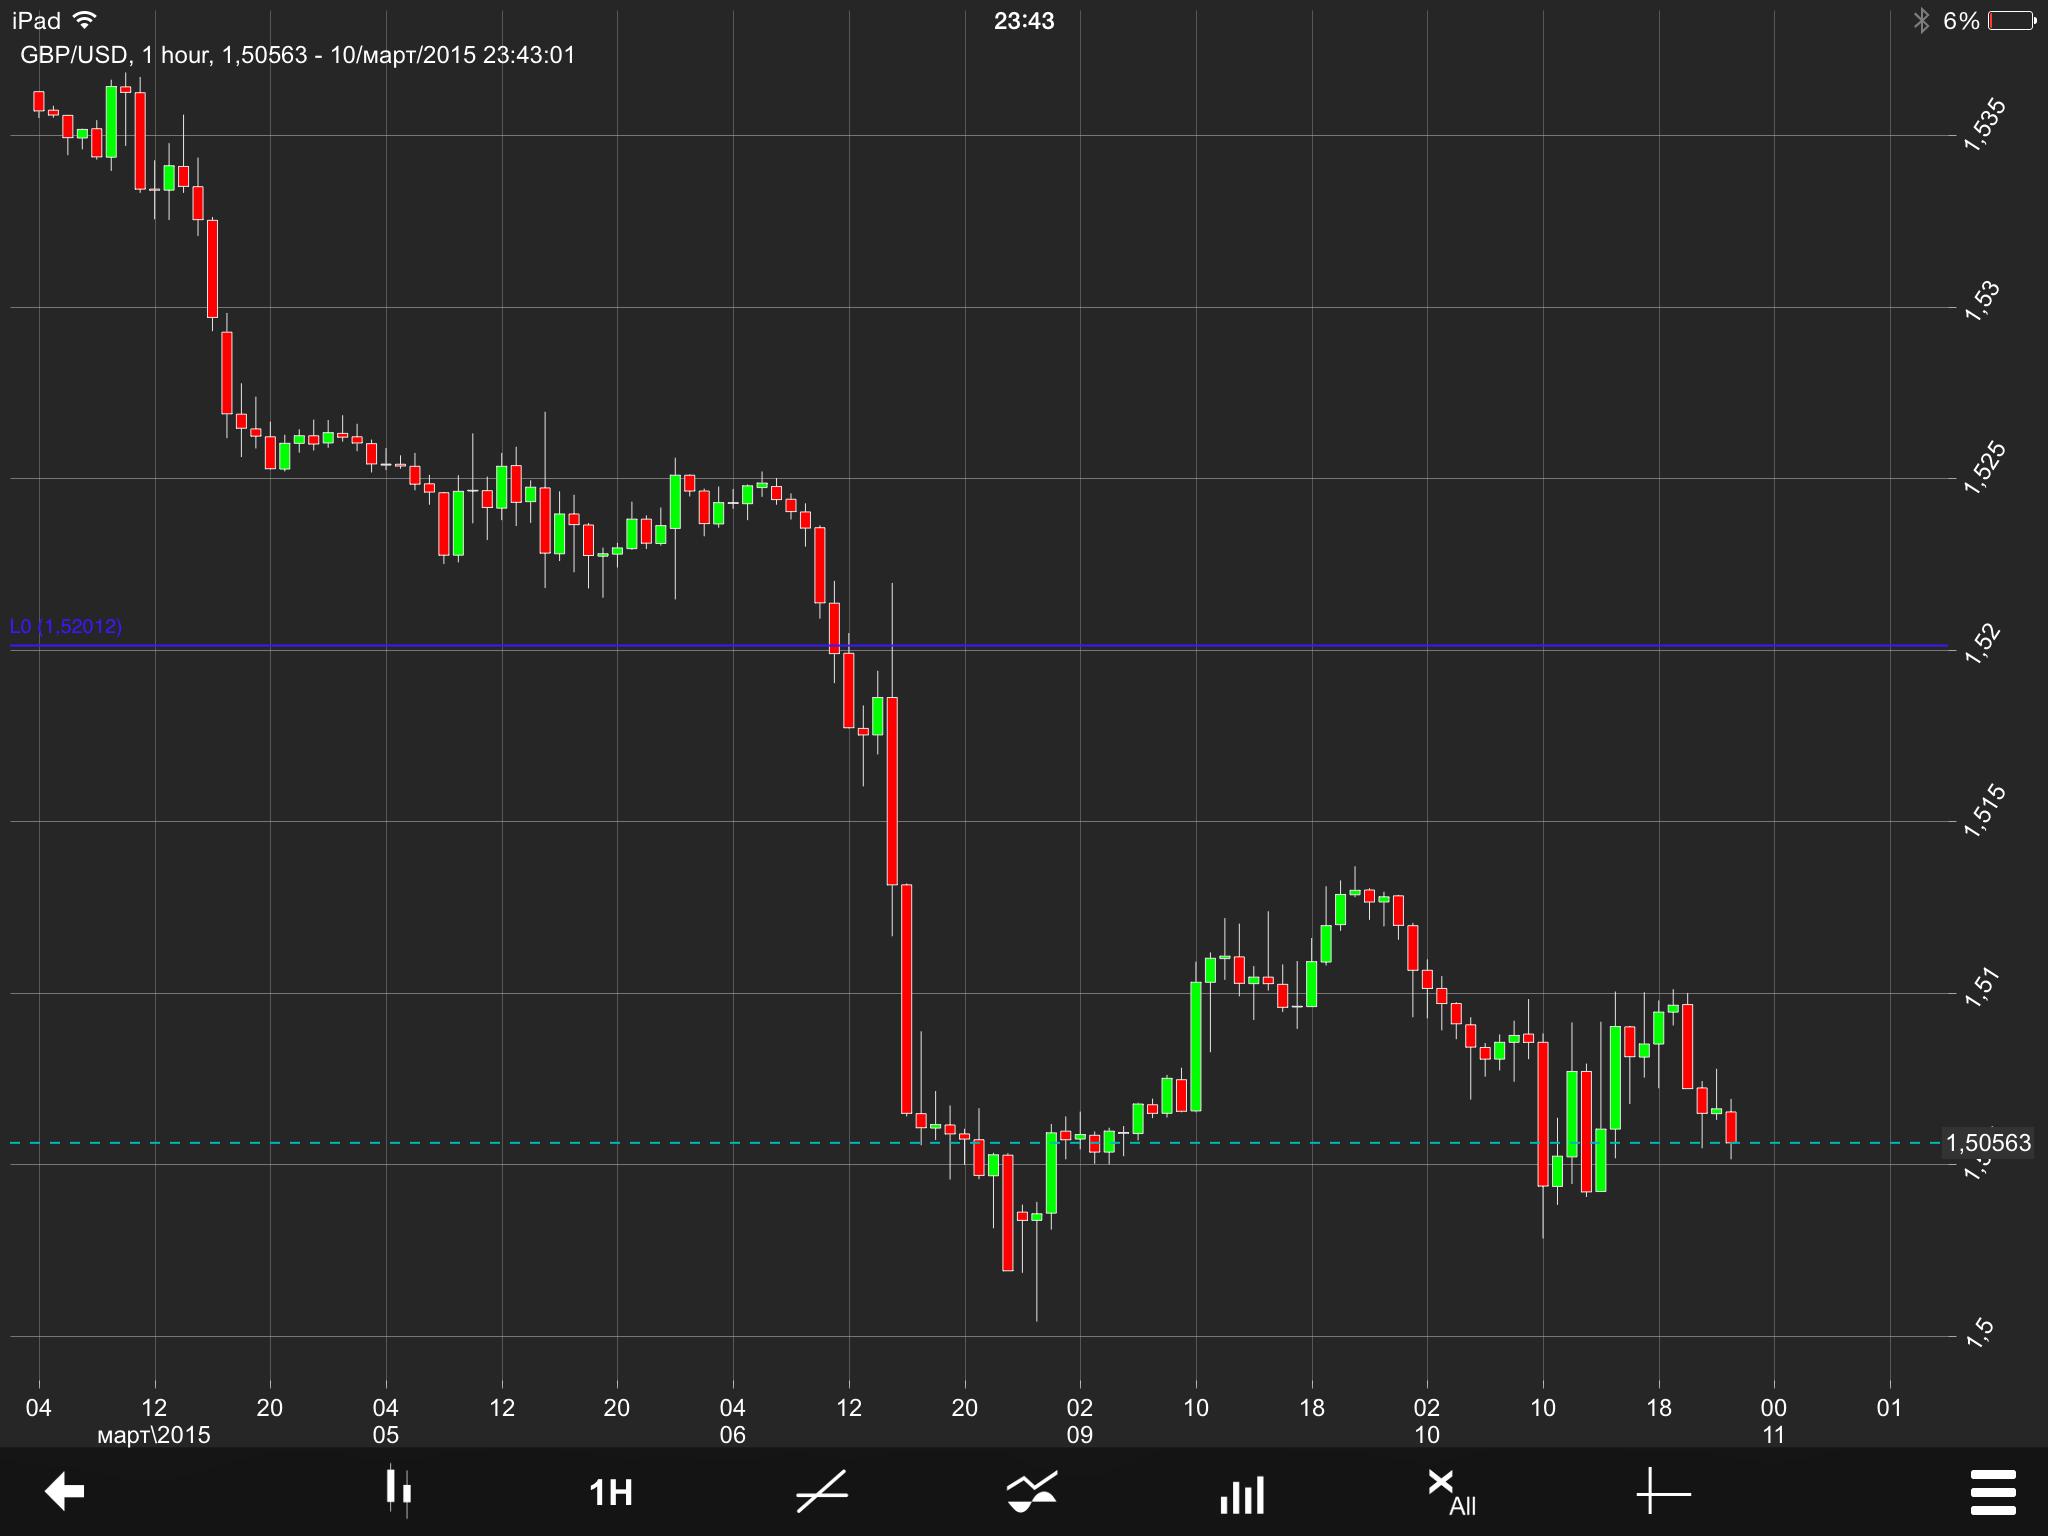 GBP/USD Chart 10 Mar 2015